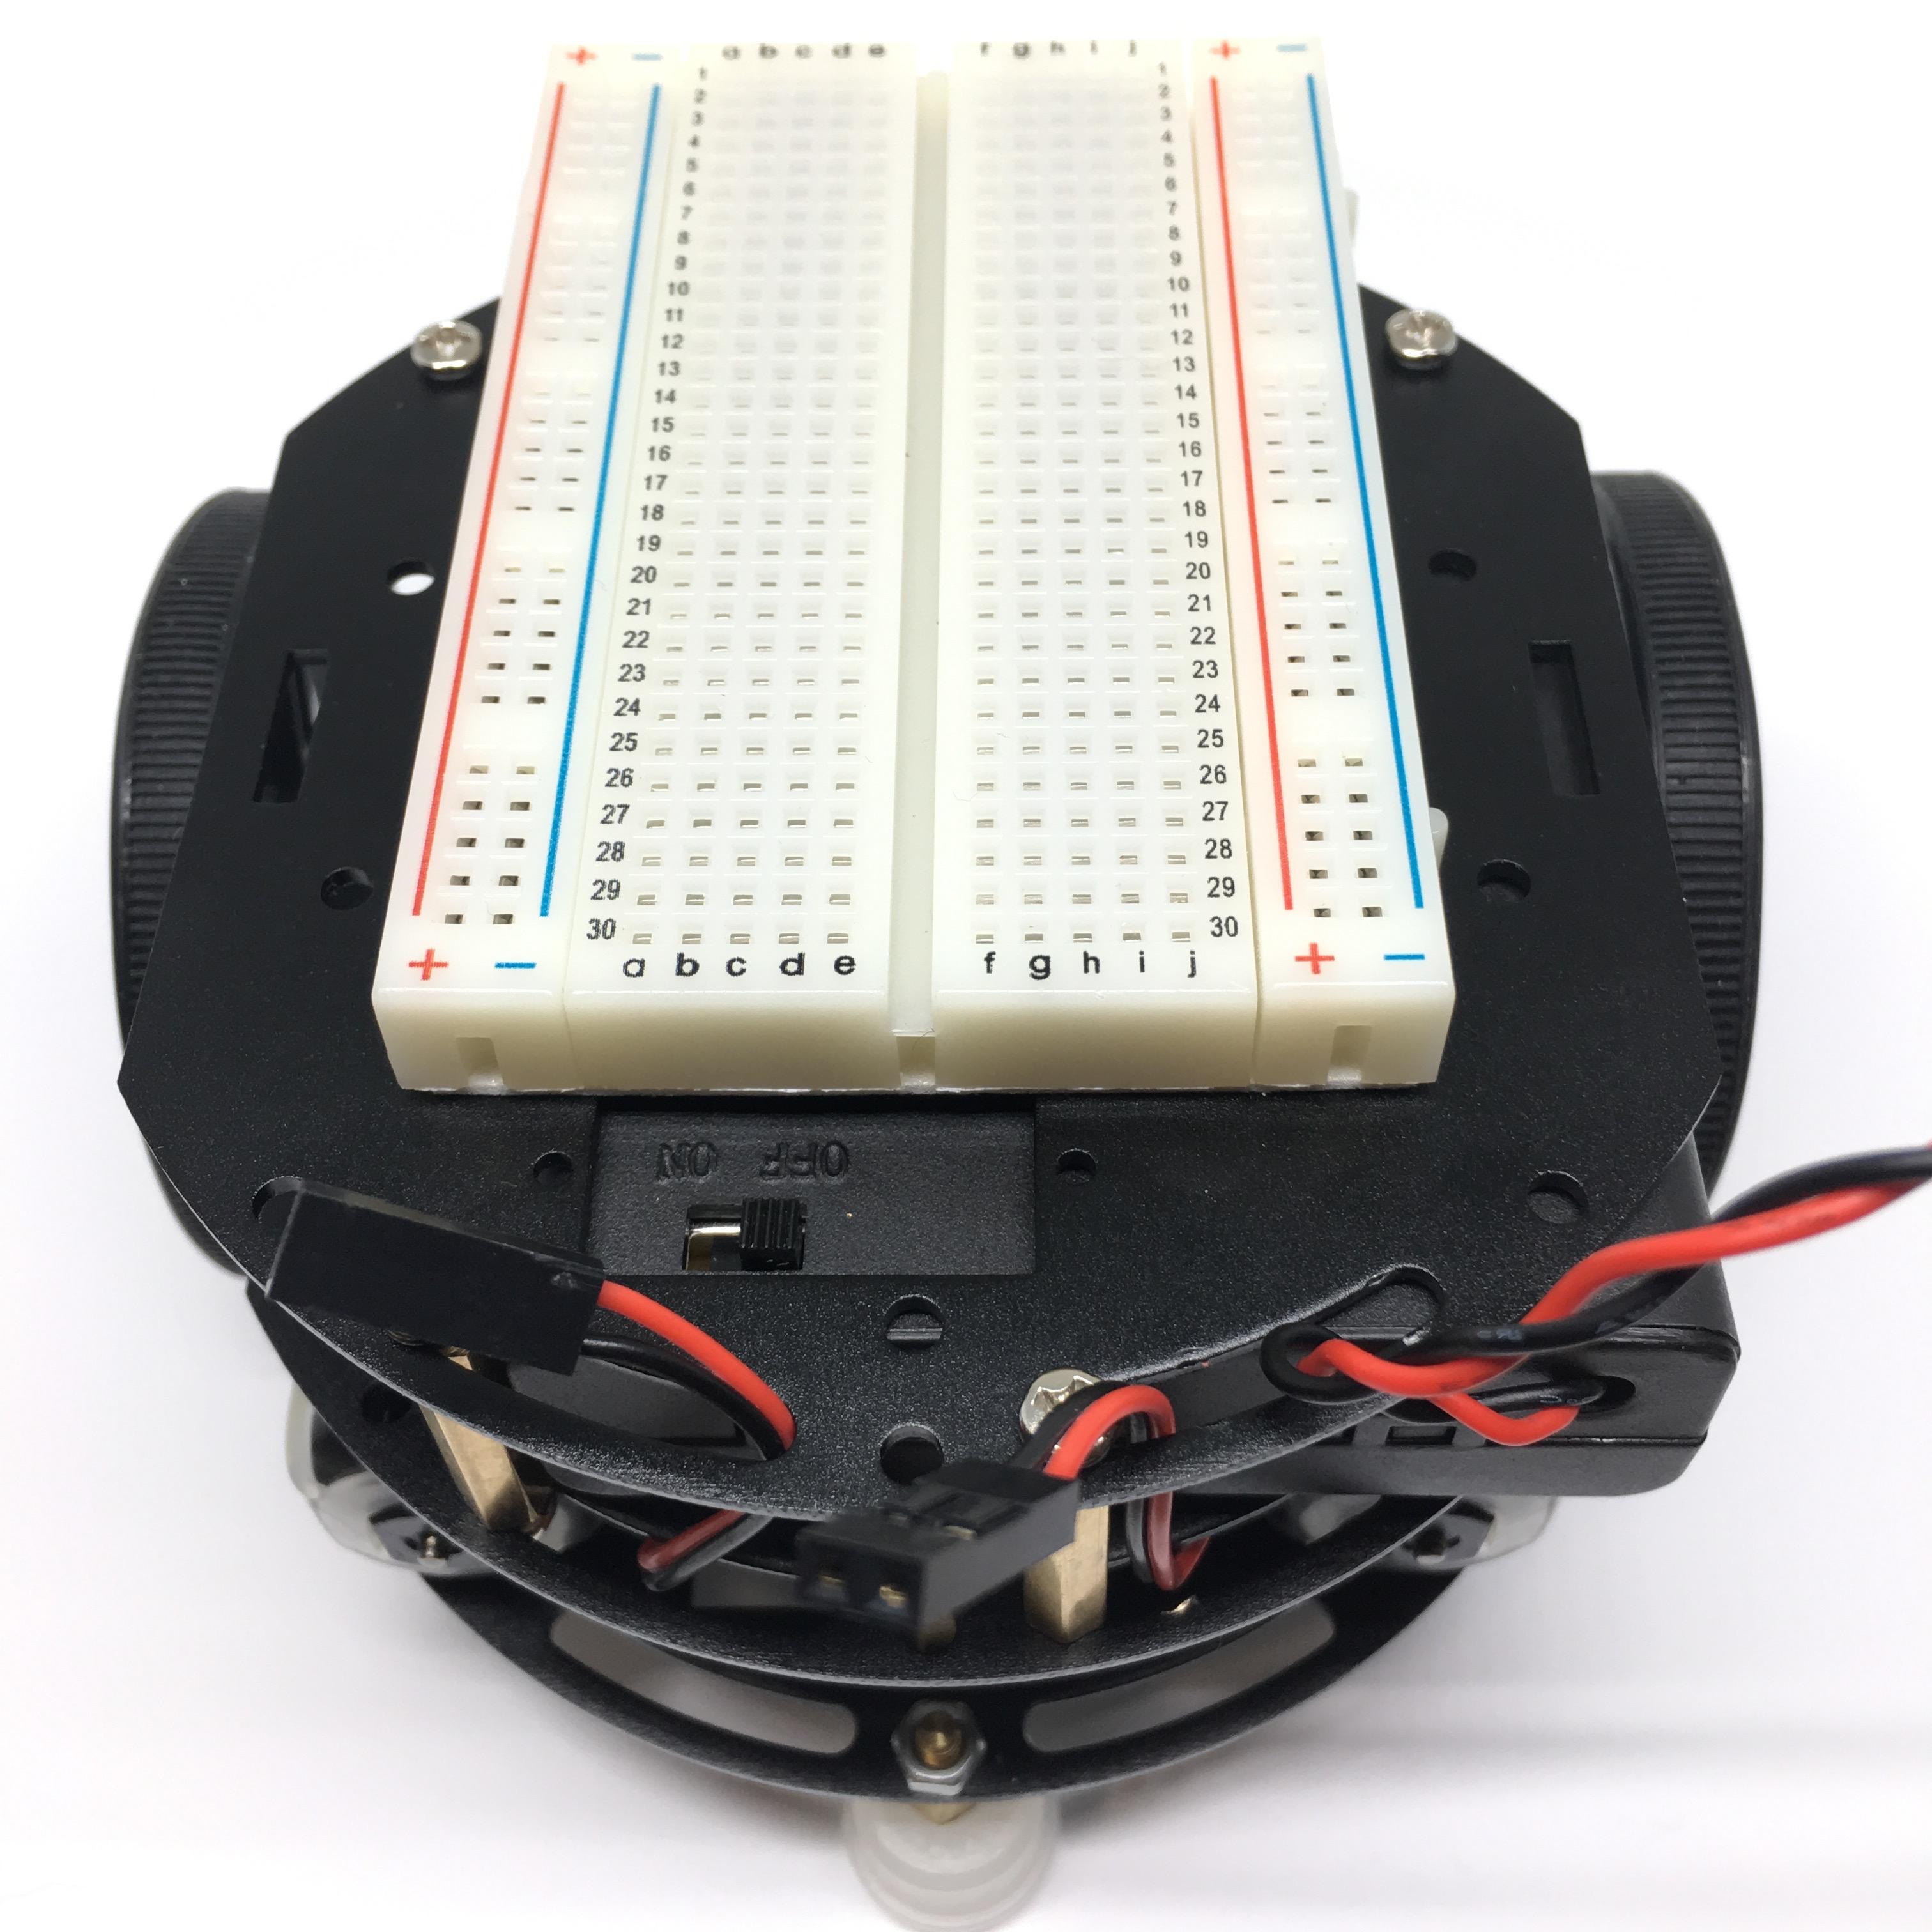 robotics_IMG_0902.jpg